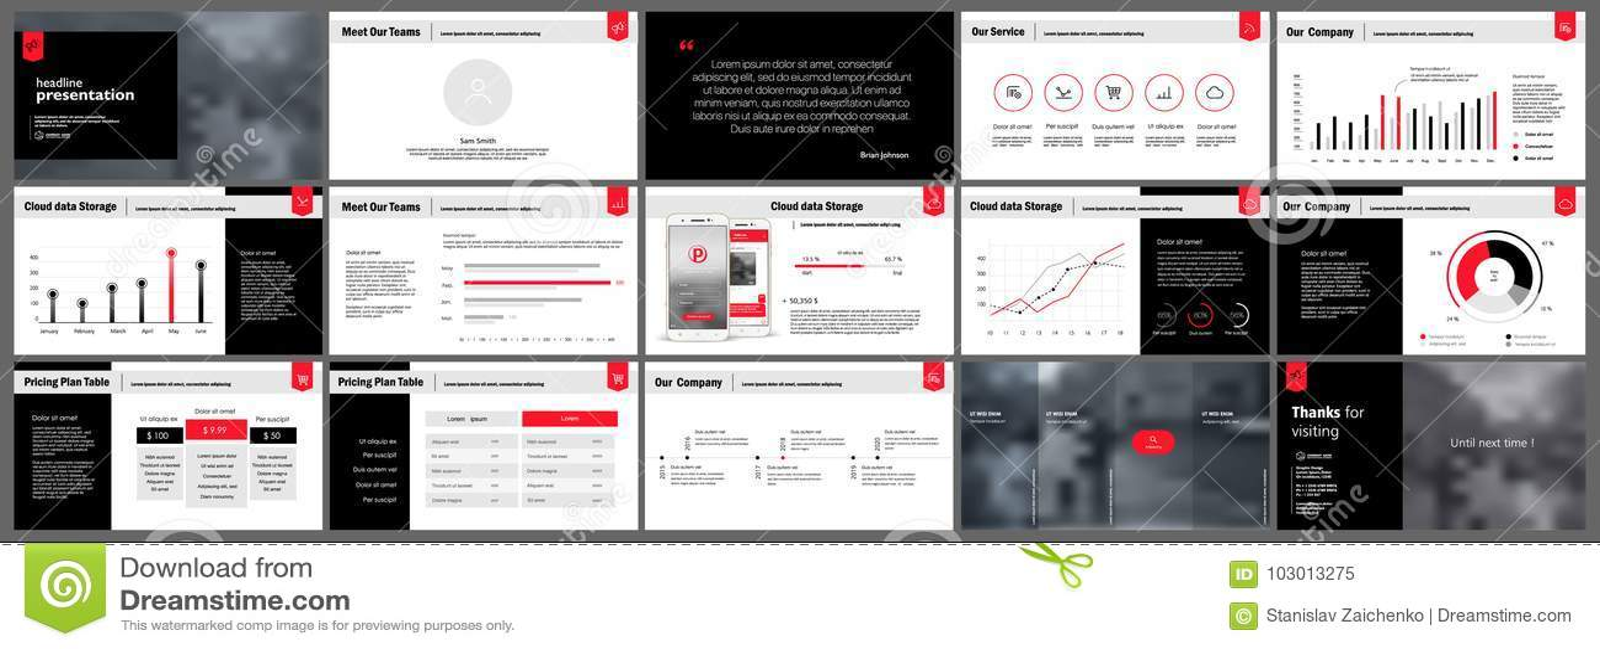 Presentation Templates Elements Stock Vector - Illustration of ...